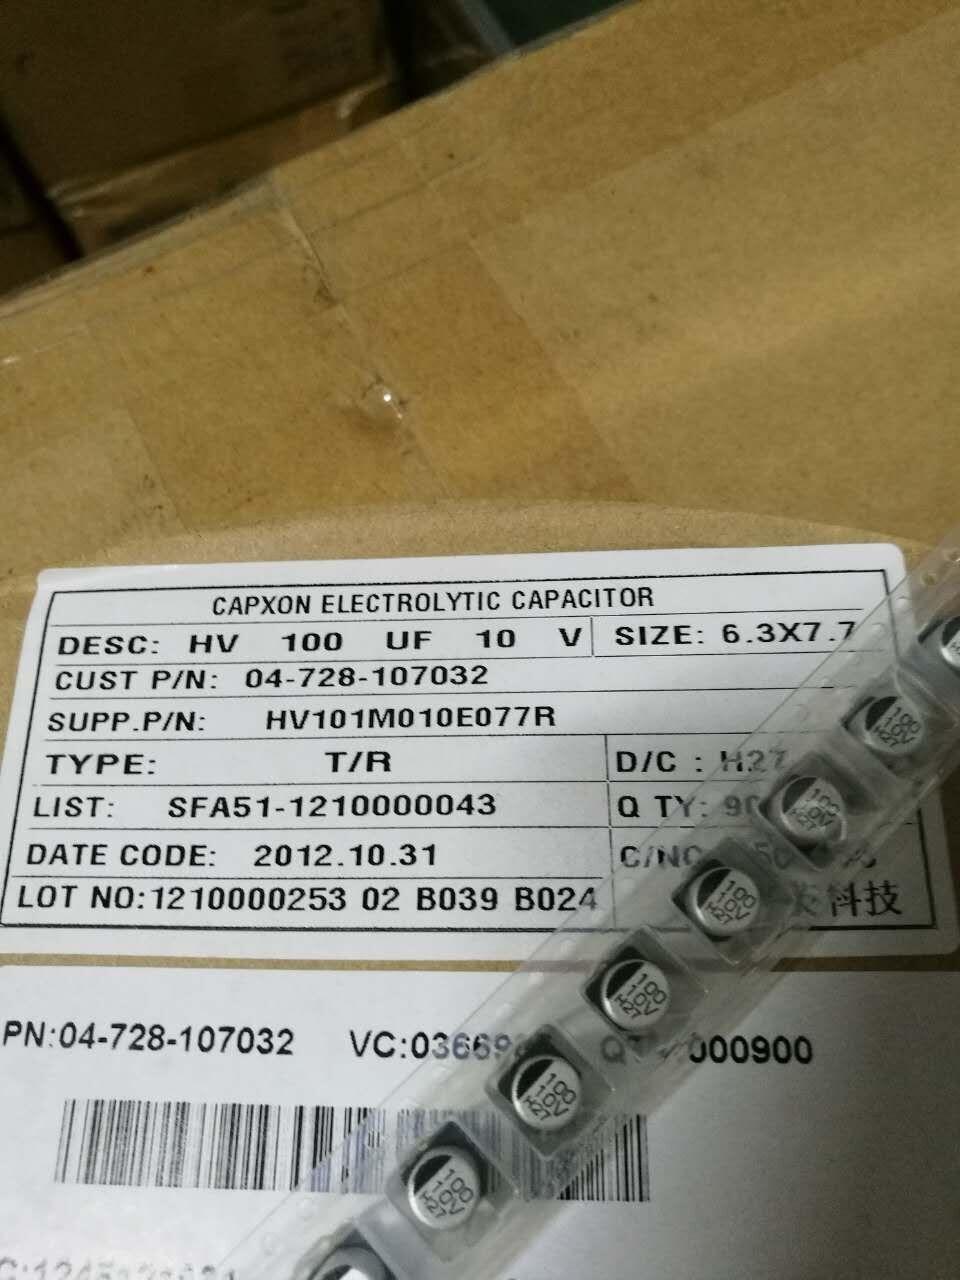 100pcs/lot CAPXON all series solid capacitor polymer capacitor SMD solid capacitor free shipping 100pcs lot fujitsu functional all series solid capacitor polymer capacitor smd solid capacitor free shipping